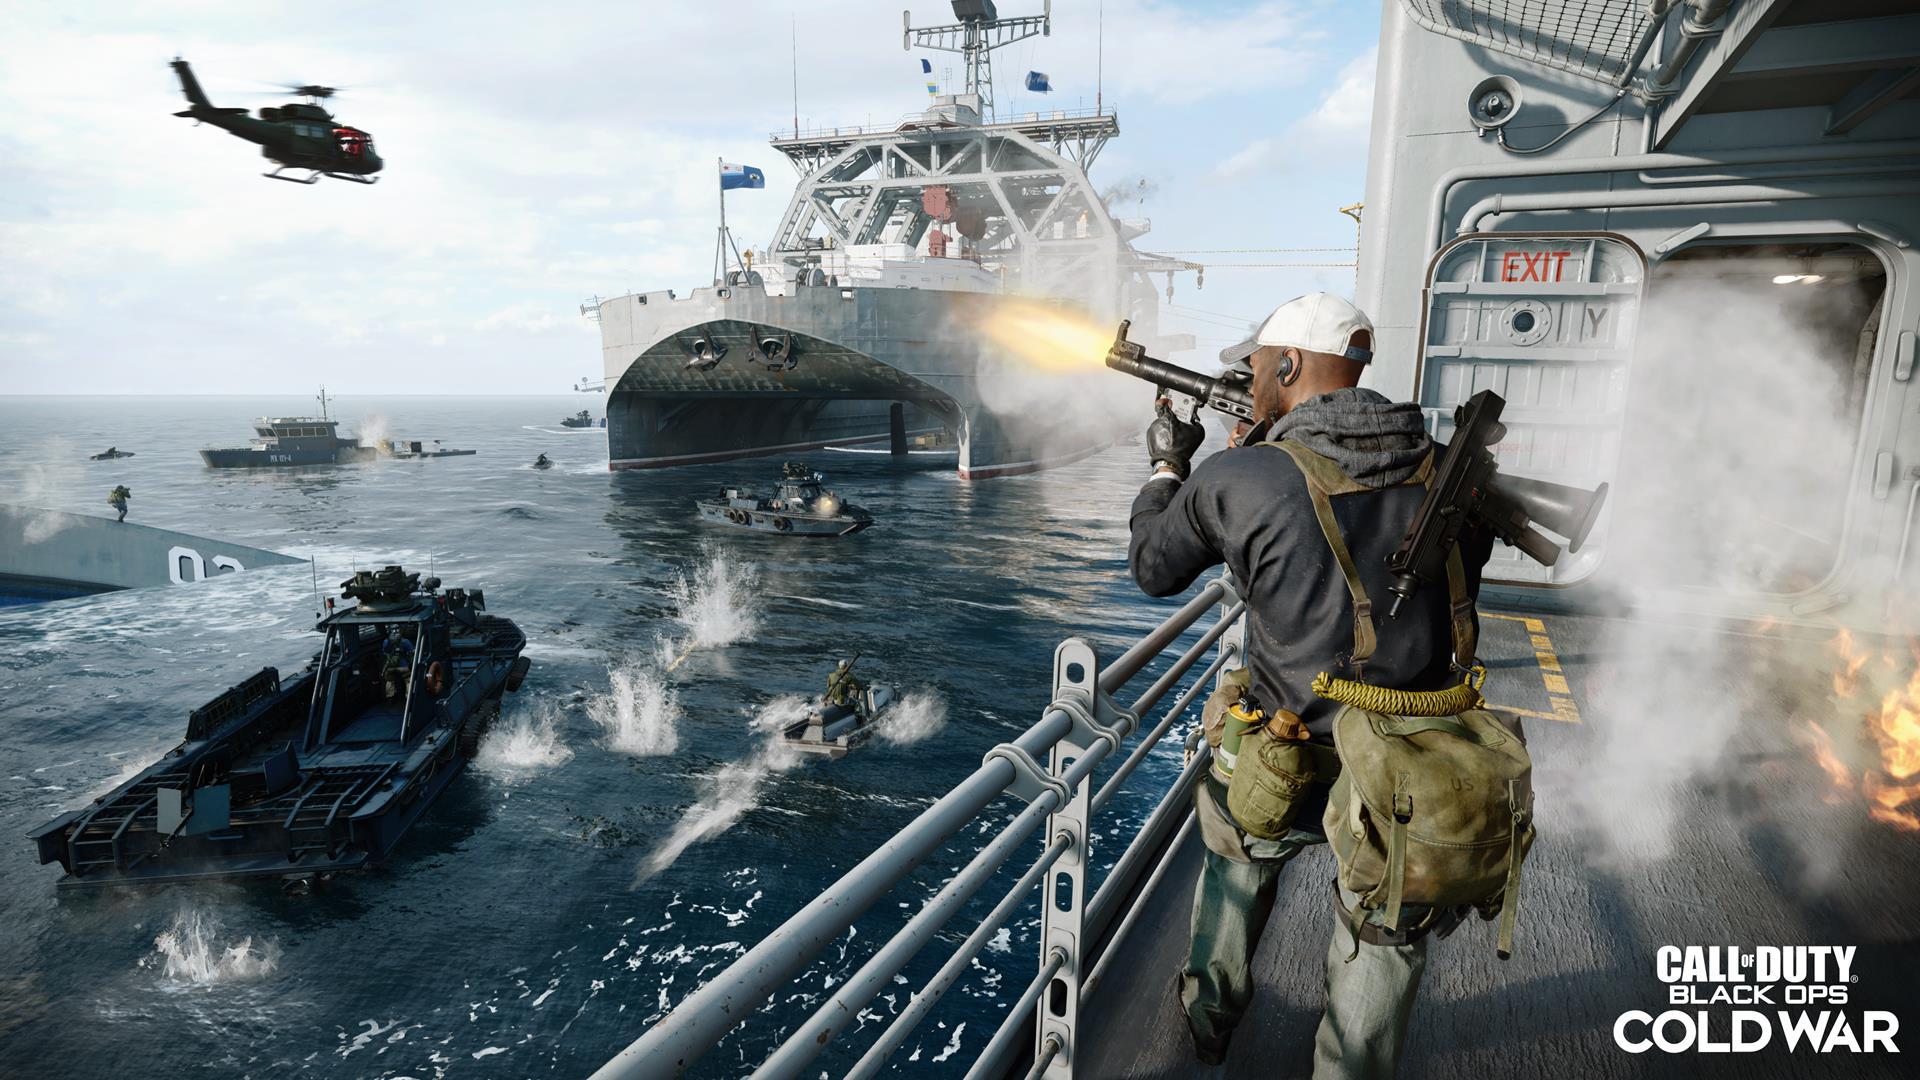 Call of Duty: Black Ops Cold War multiplayer beta tips: new Scorestreak, longer TTK, Wild Cards and more thumbnail